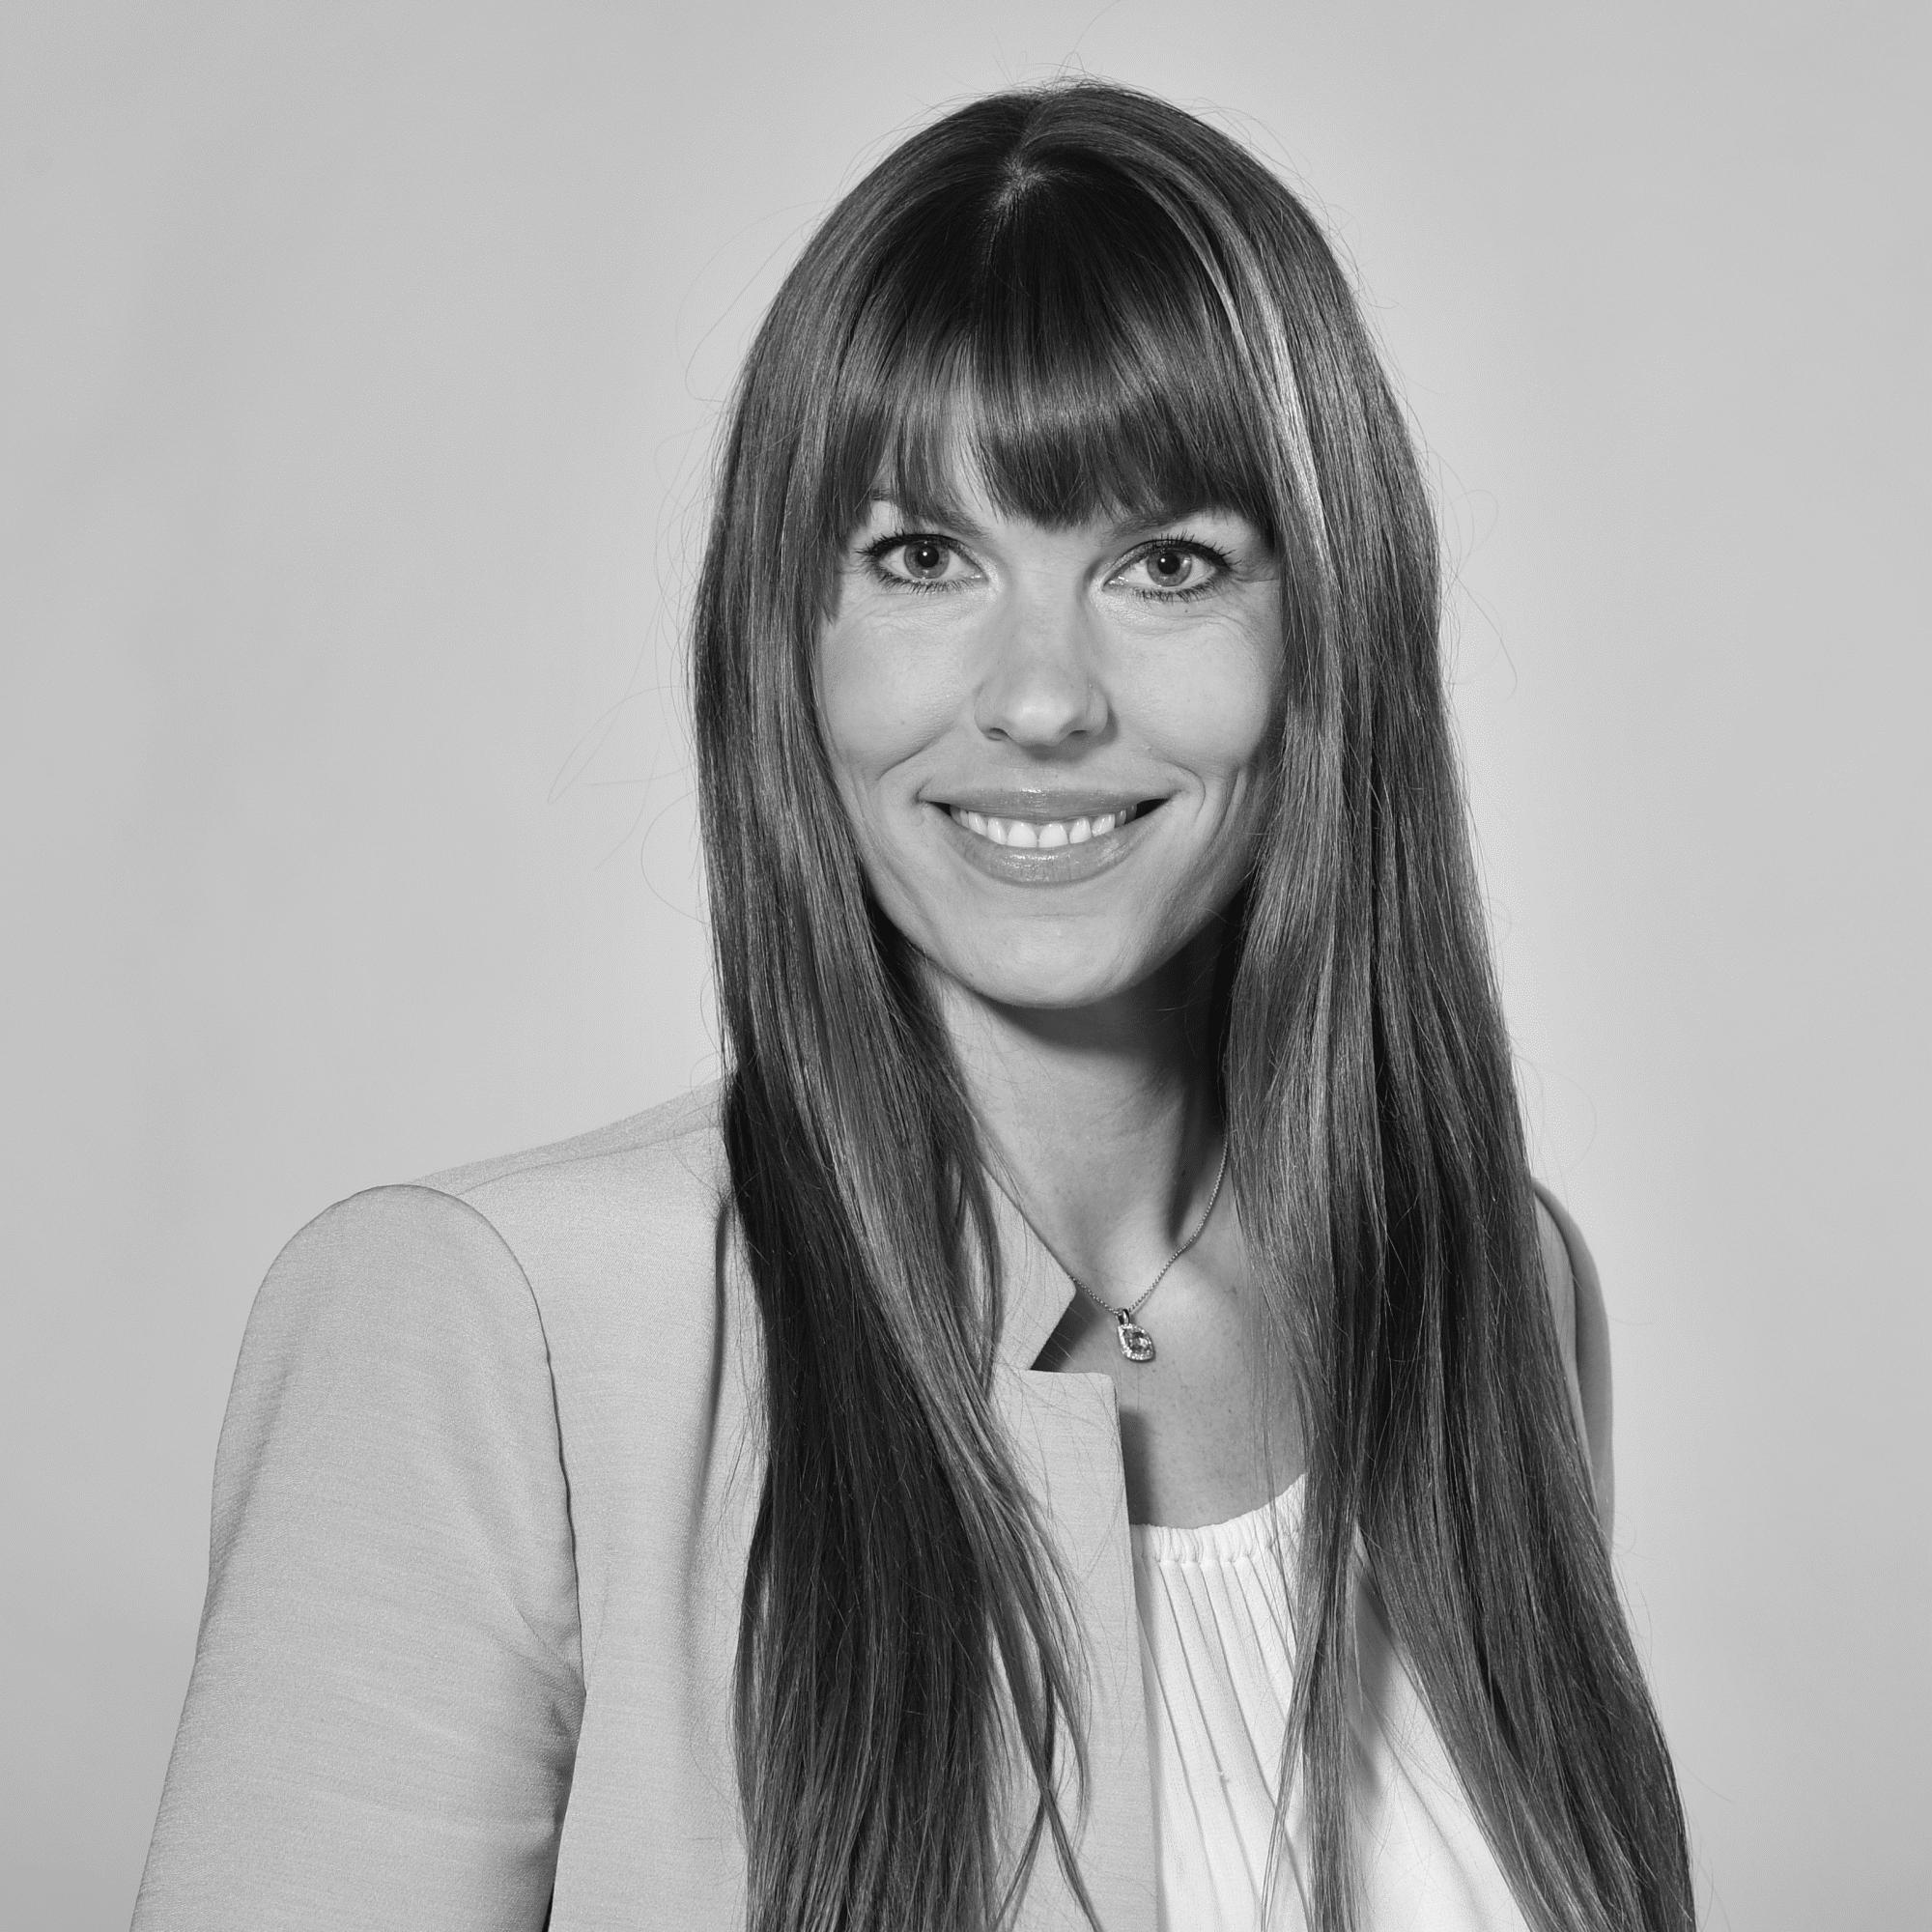 SarahJohannsenRothsw